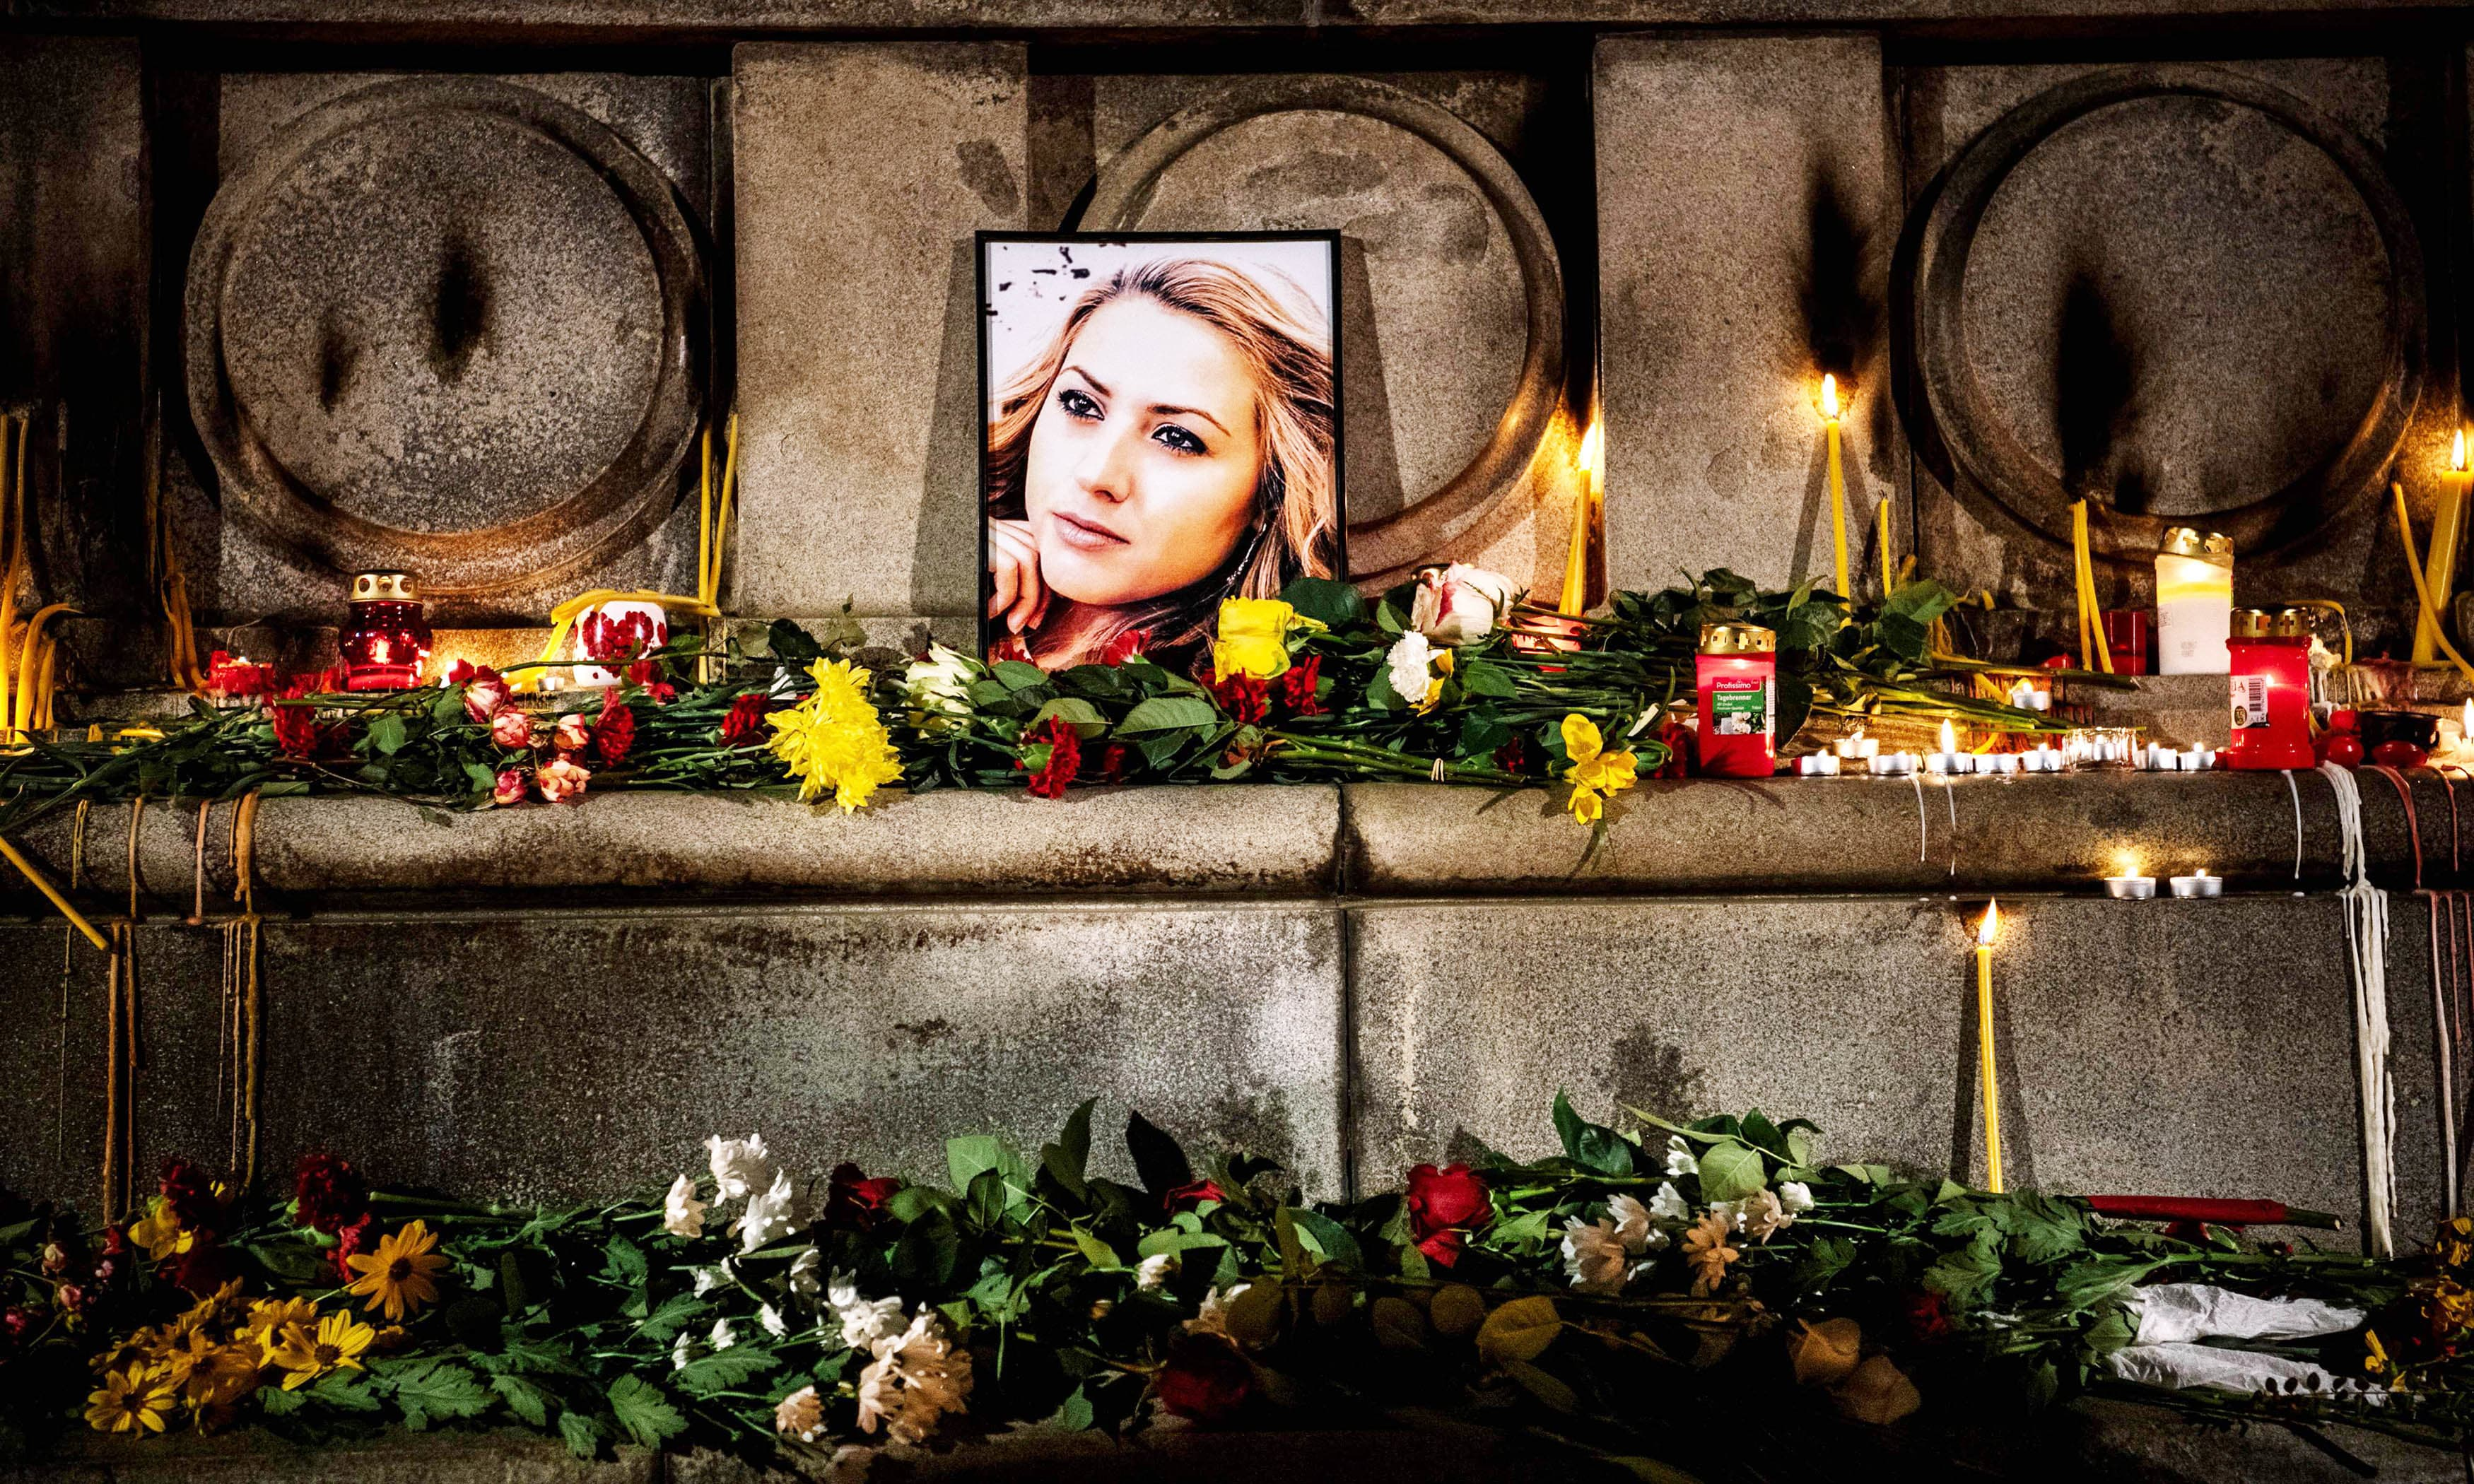 EU member Bulgaria under pressure after journalist's brutal murder